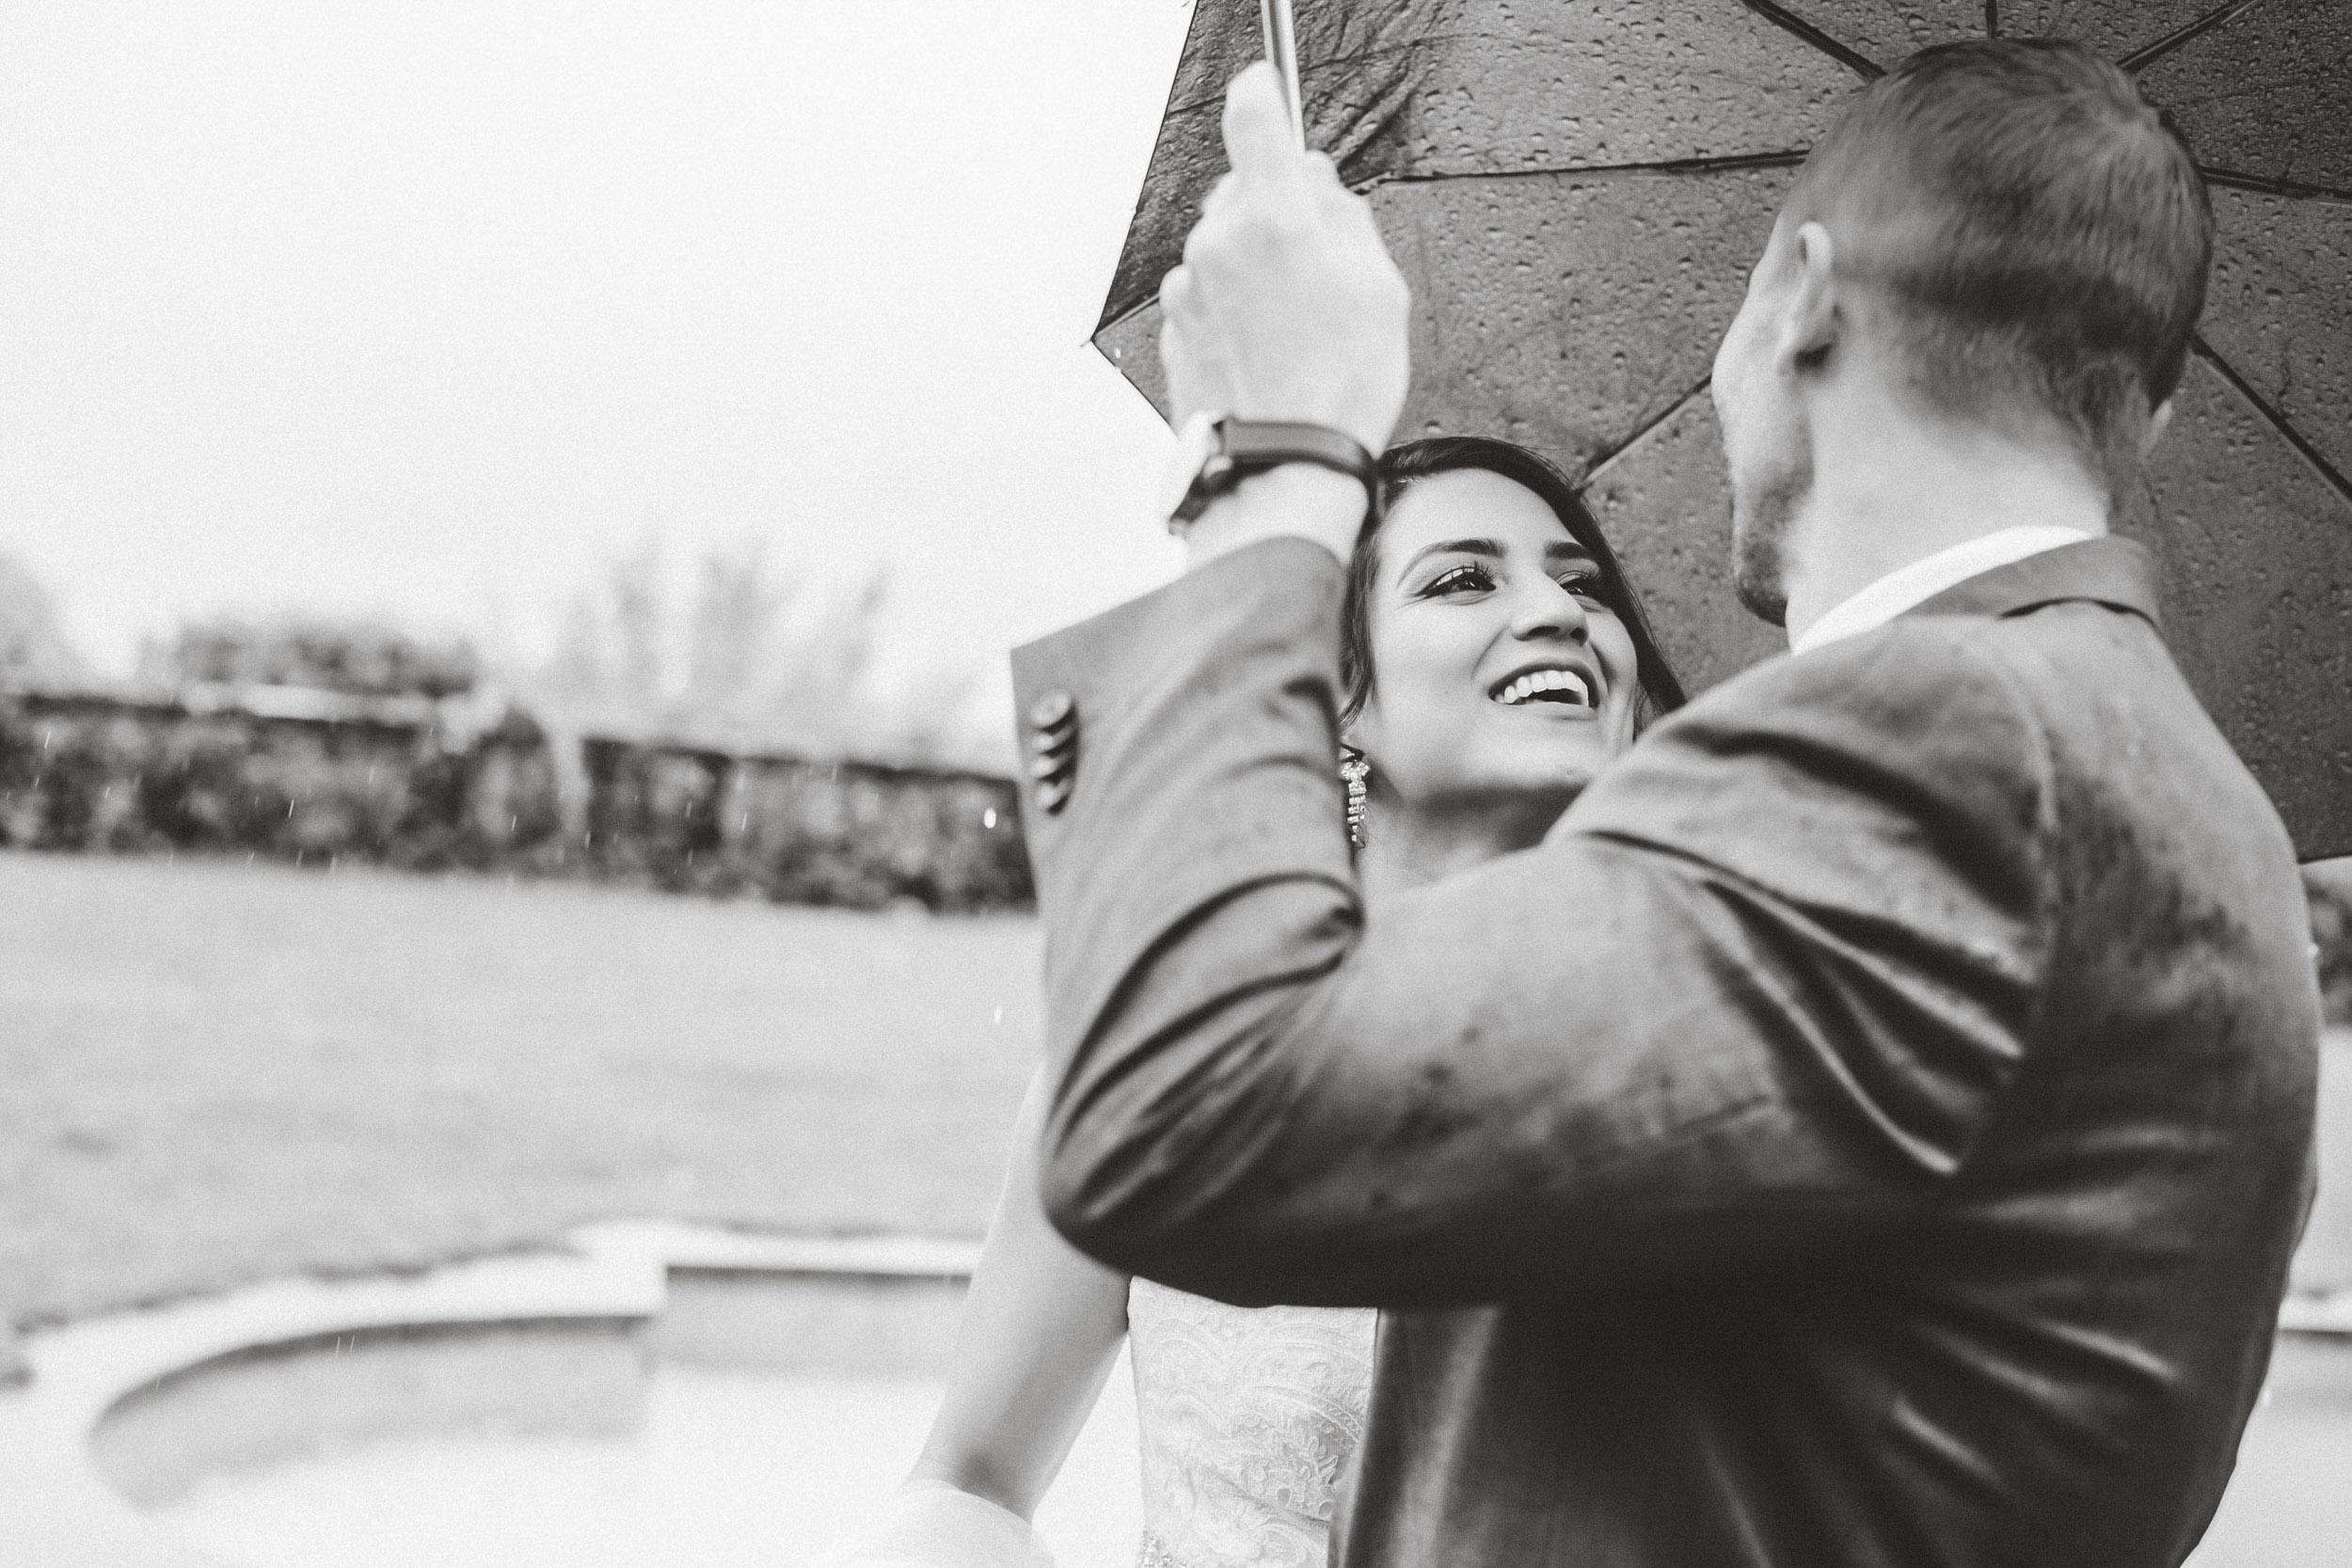 hochzeitsfotografie-schweiz_wedding-photographer-switzerland-europe_Bendik-Photography-064